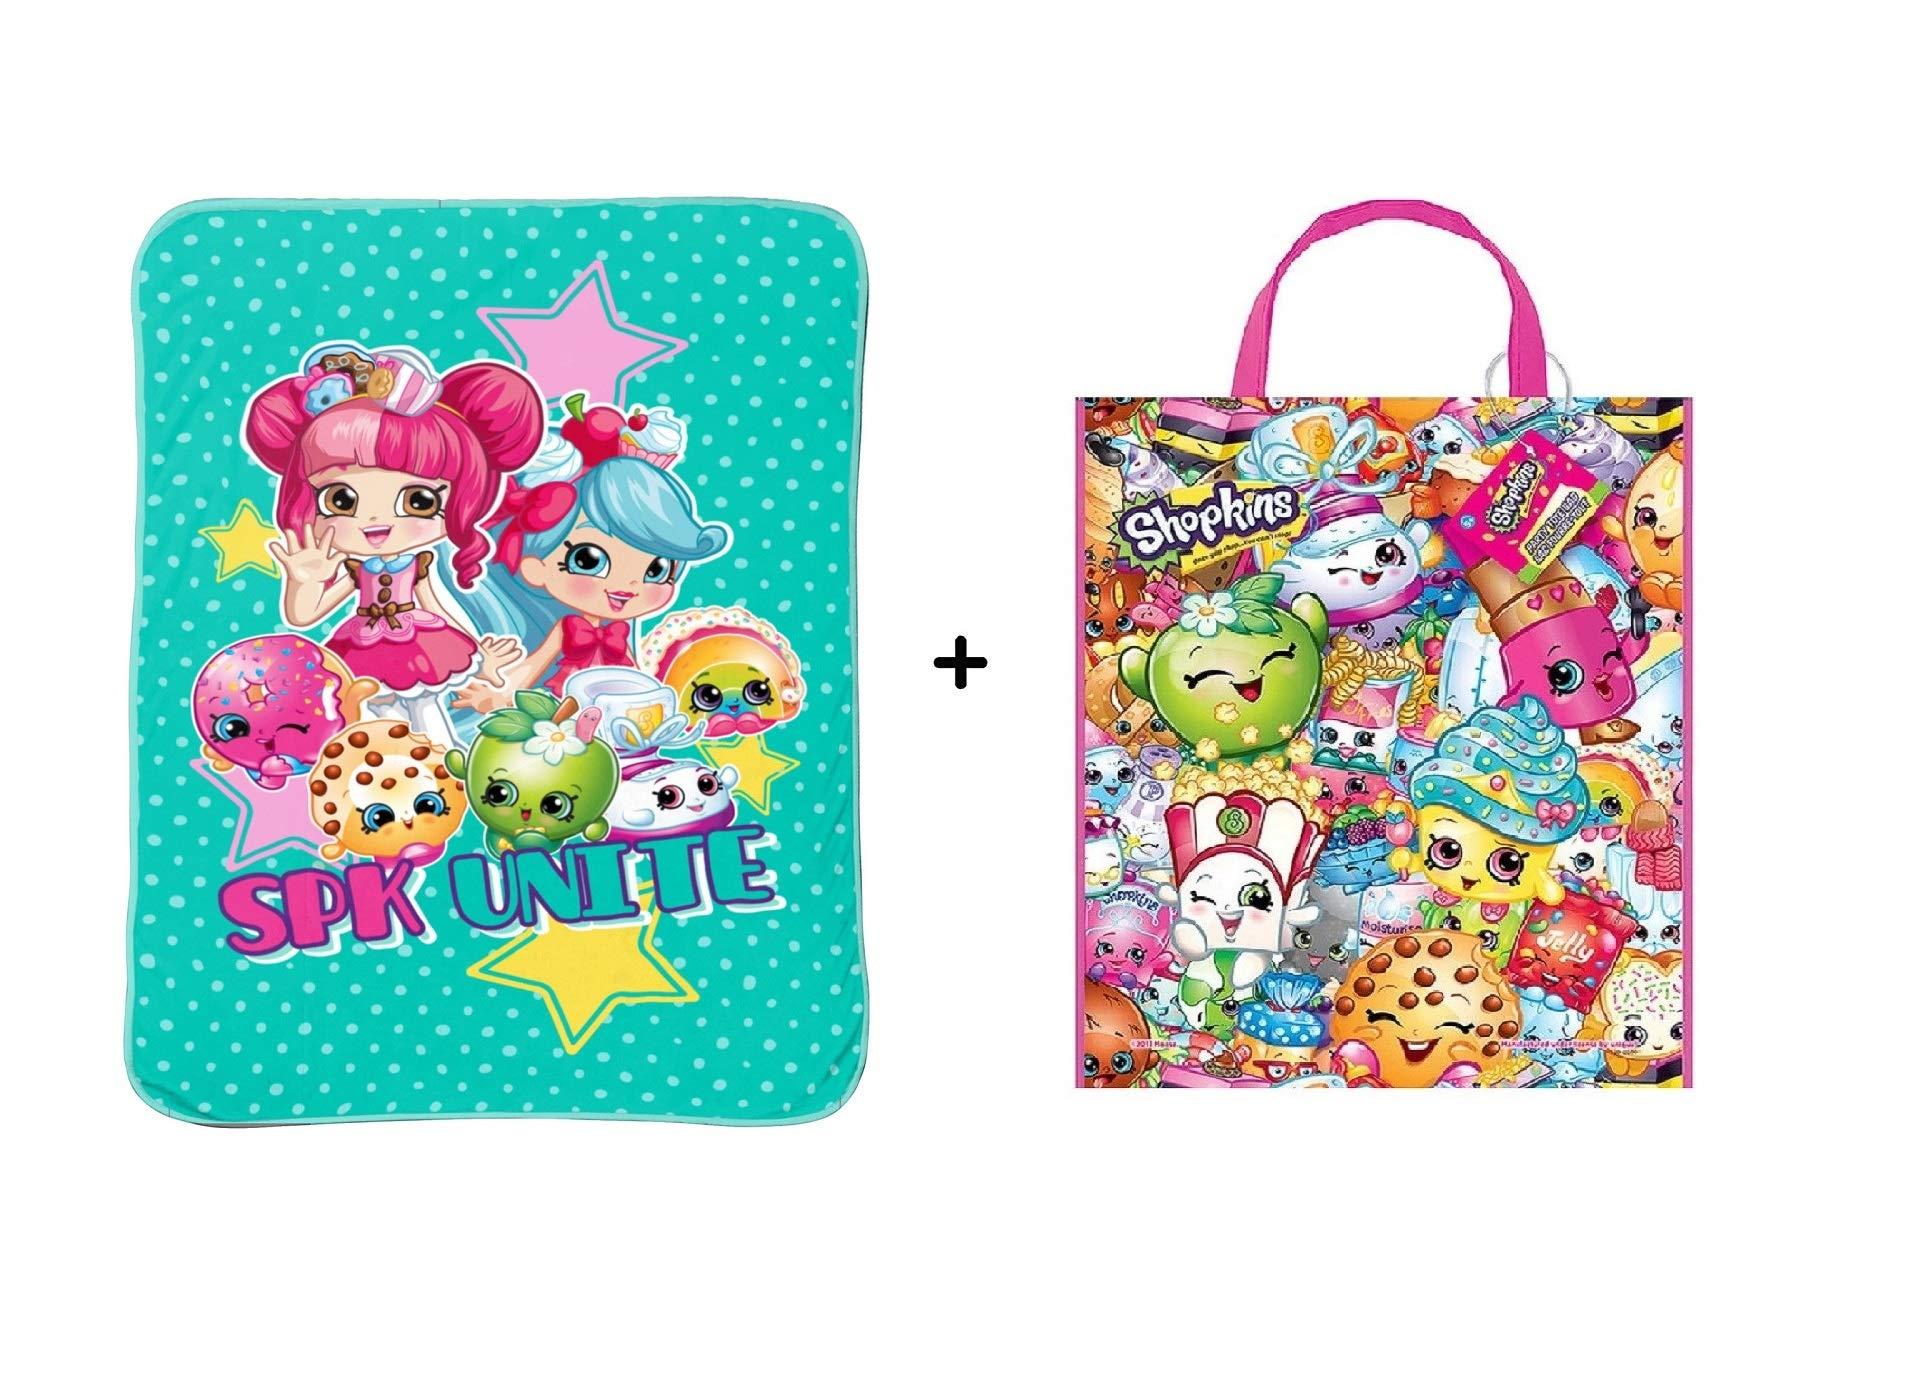 Shopkins Girls '' World Traveler '' Plush Blanket + Tote Bag • Gift Pack by Shopkins